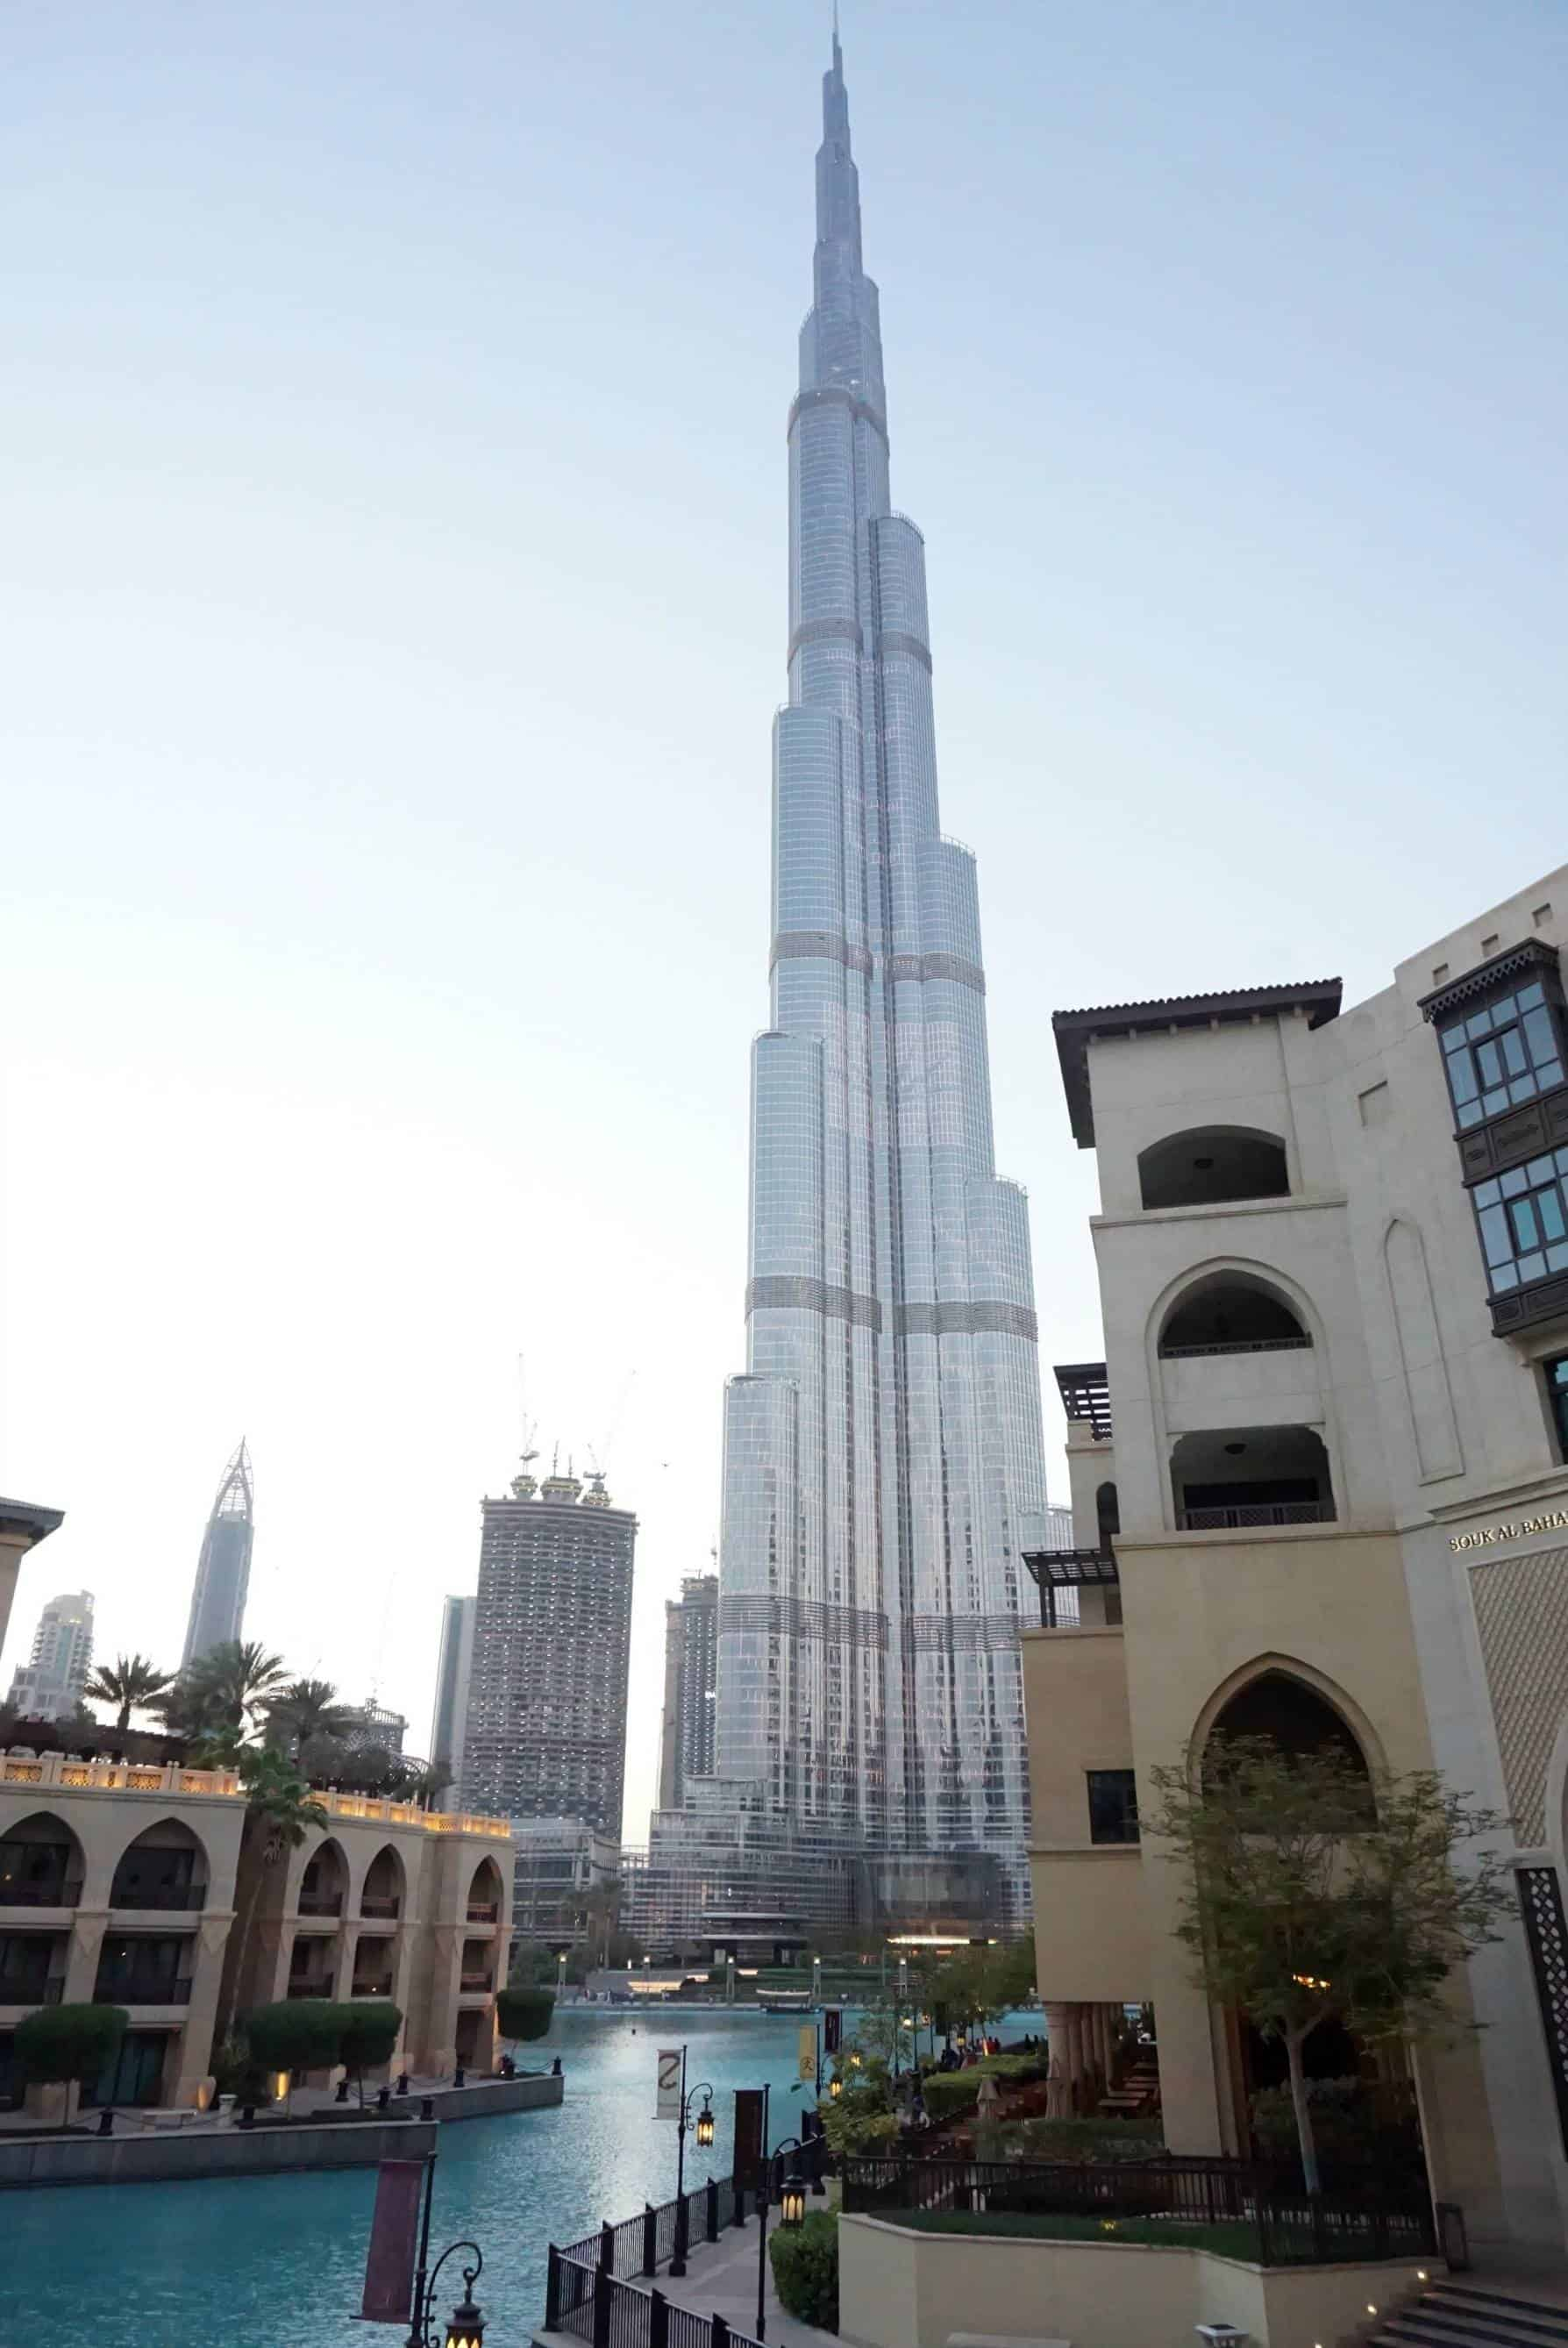 My Sunday Photo, The Palace, Down Town Dubai